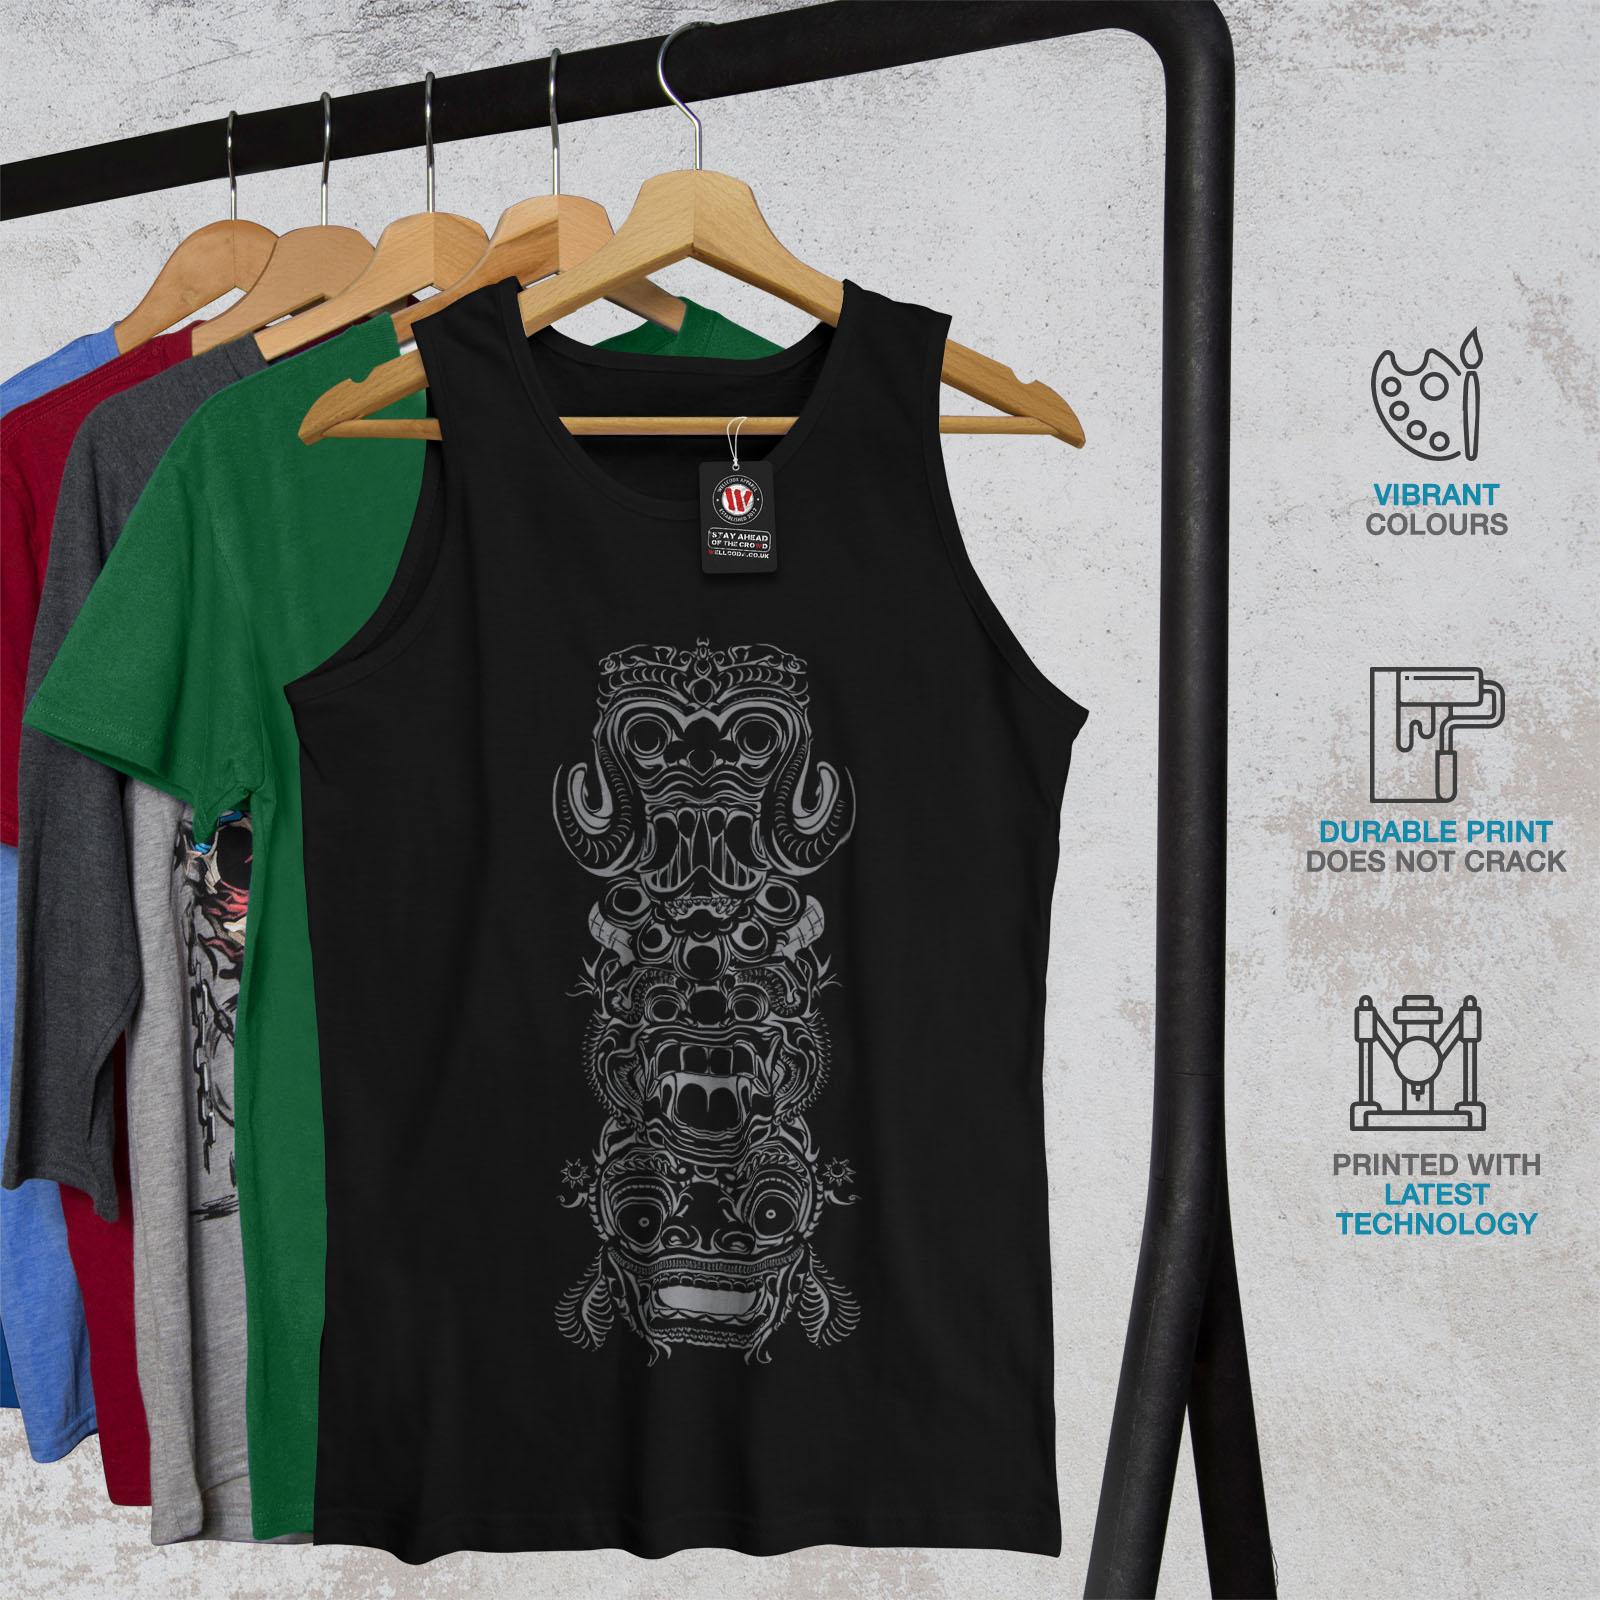 Wellcoda Spiritual Totem Fashion Mens Tank Top Bali Active Sports Shirt